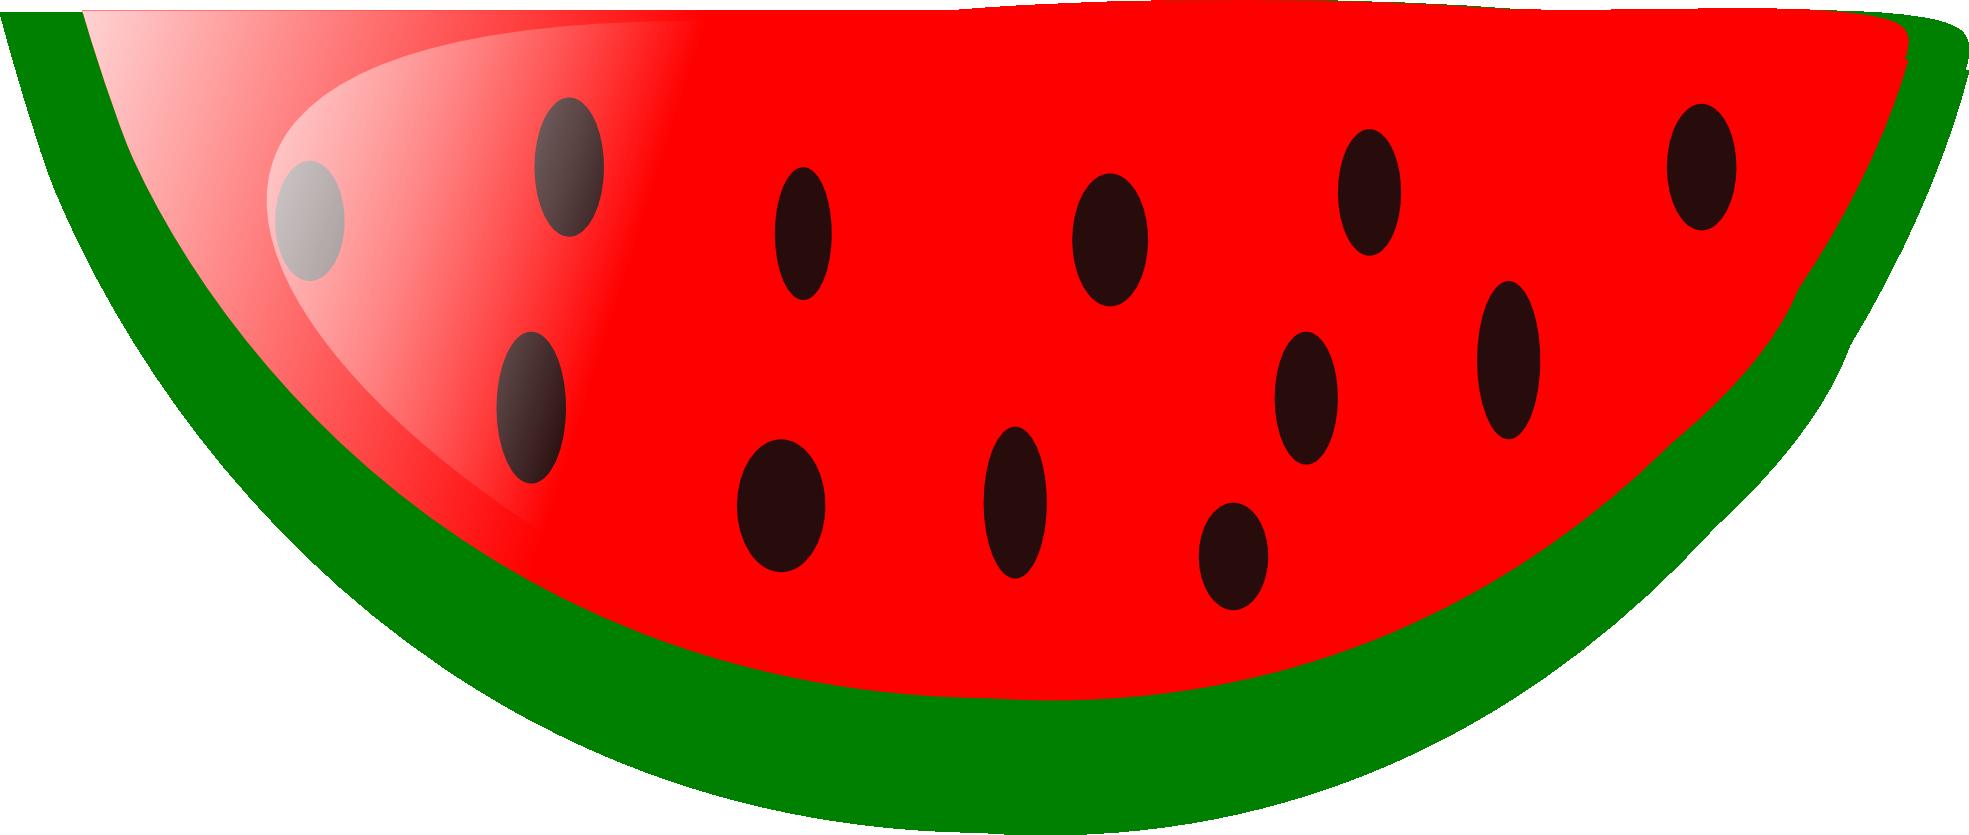 Watermelon clipart watermelon slice. Panda free images image